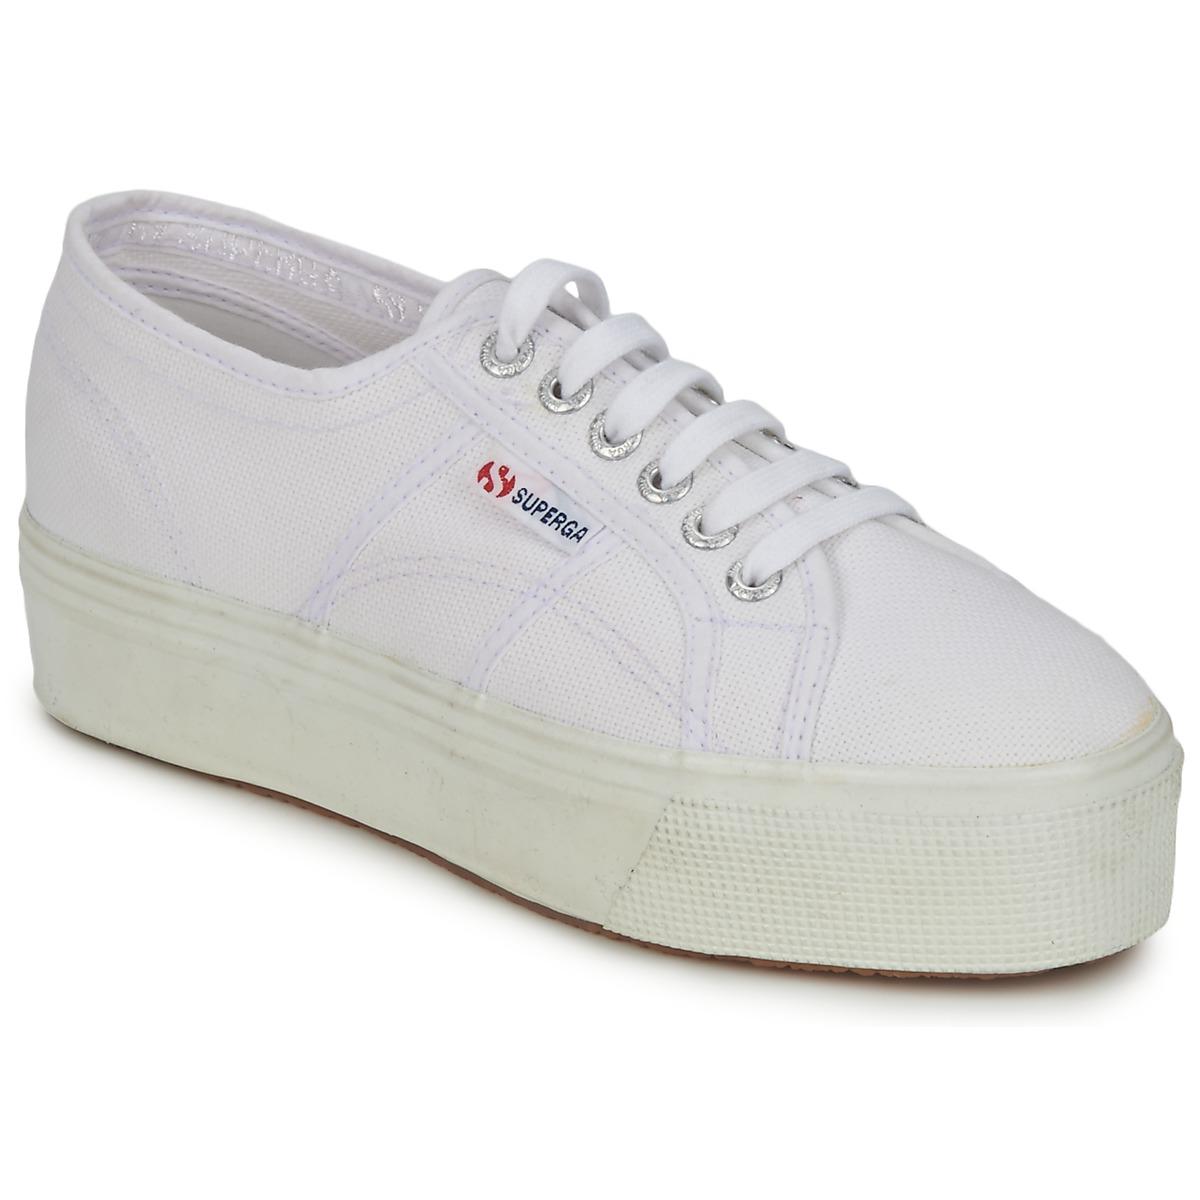 Superga Sneaker Scarpe Piatto Scarpe Da Ginnastica Cotu Classic s0037l0 901 Bianco Nuovo